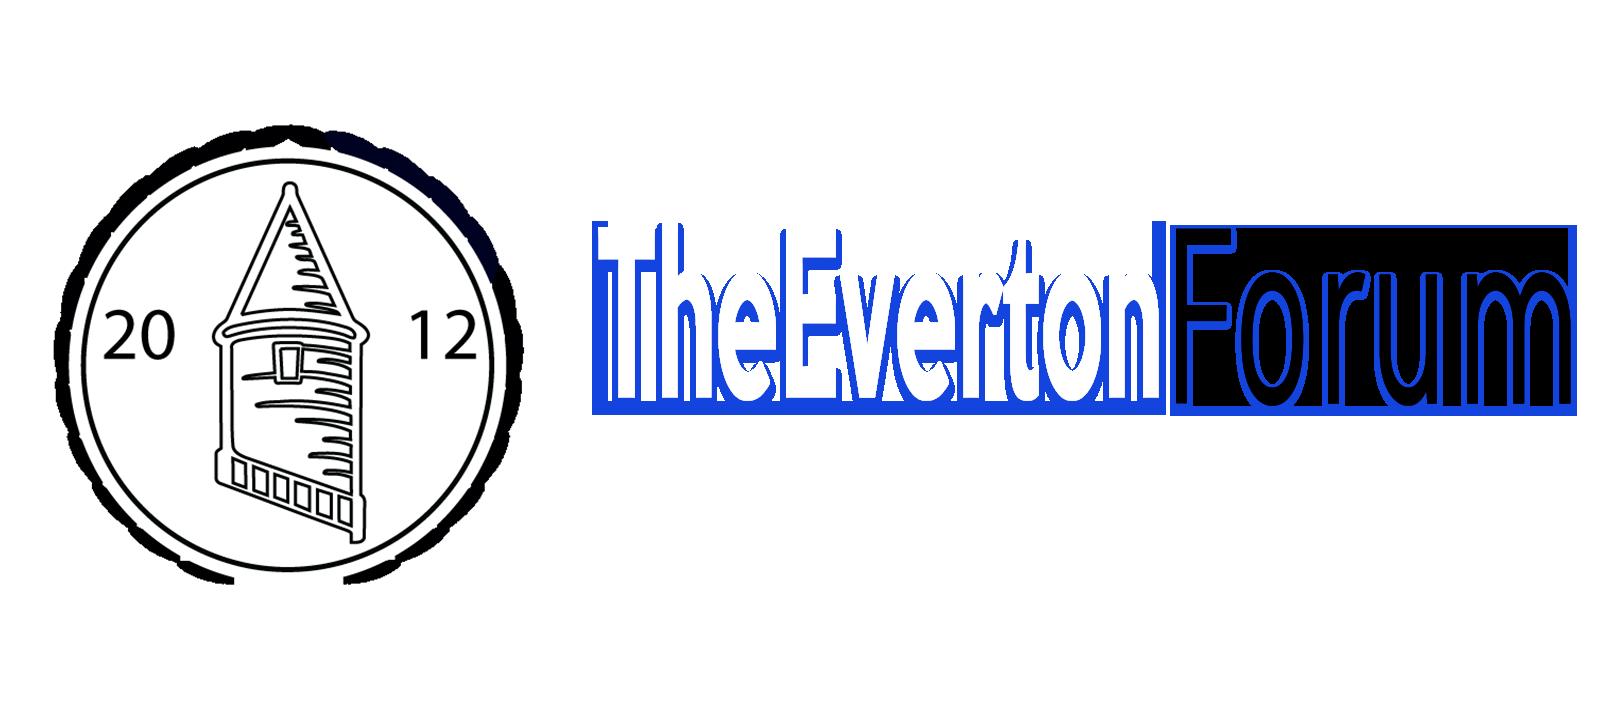 Everton V Brighton The Everton Forum Preview Everton Forum The Latest Everton News And Everton Forum